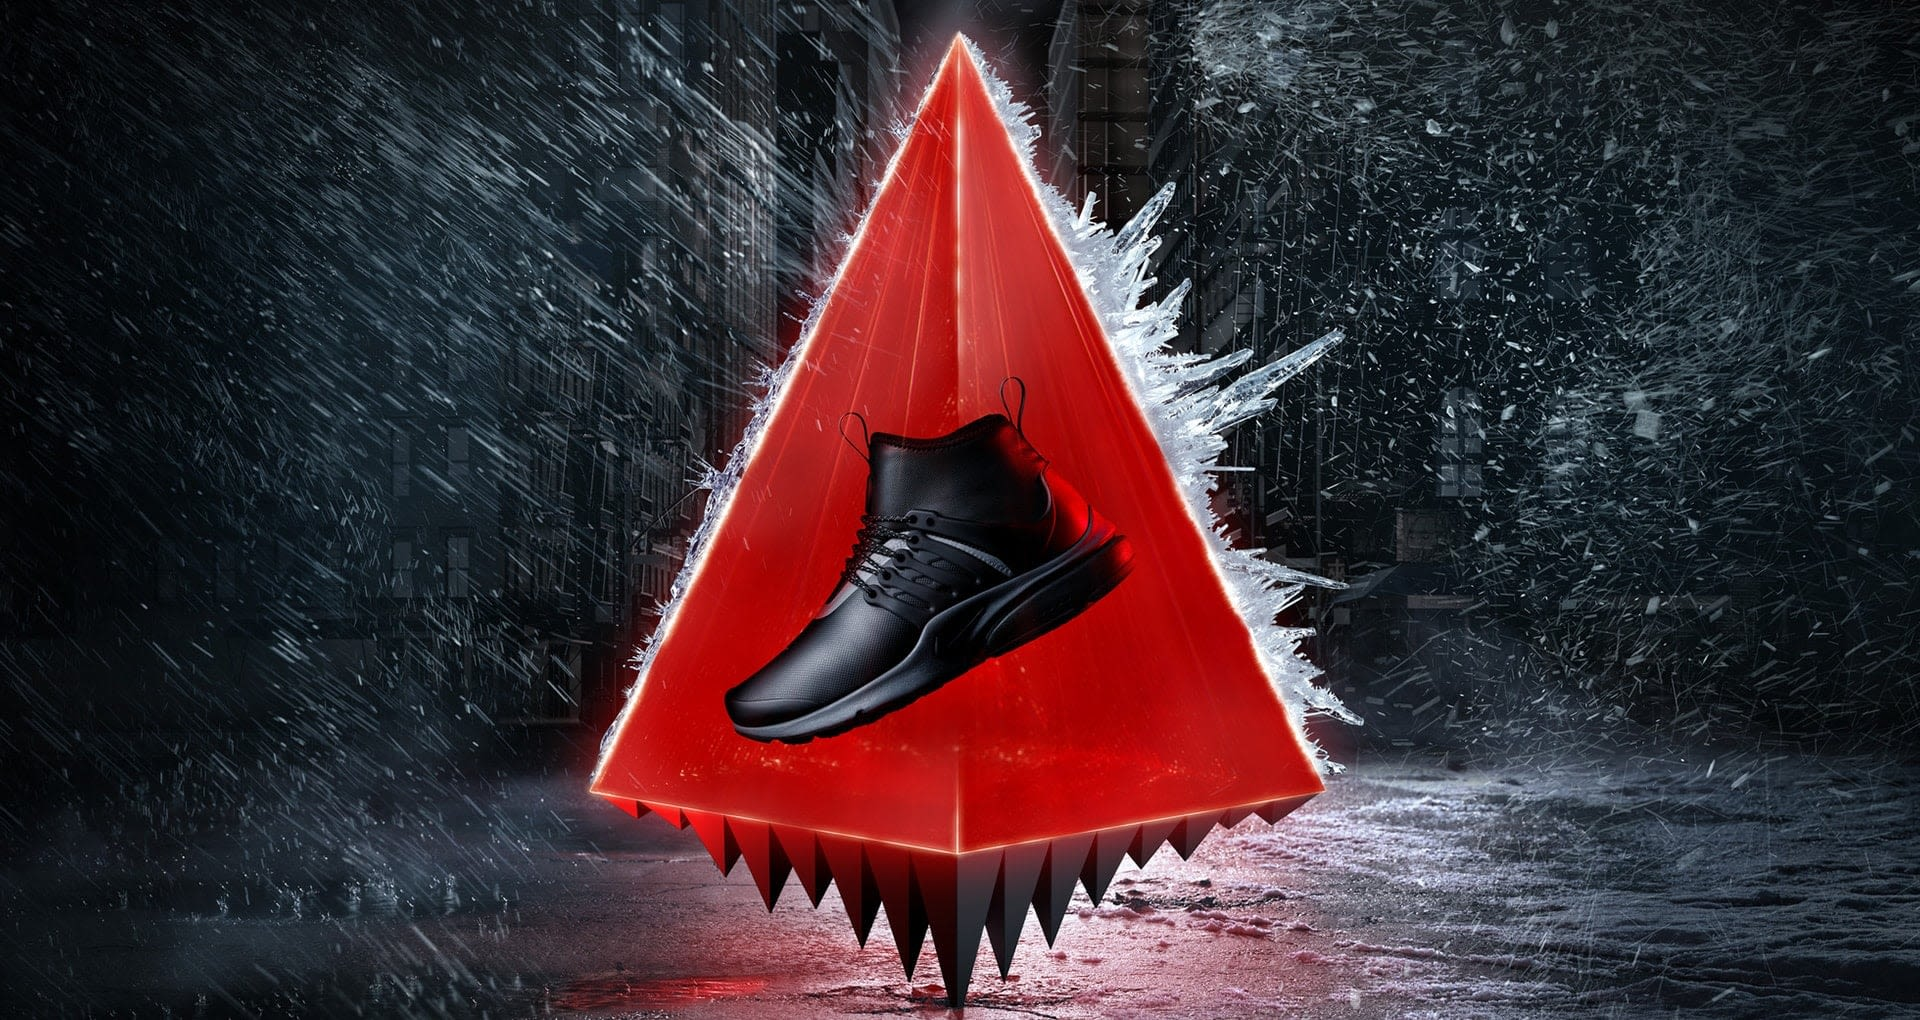 sale retailer 8516d f73b6 Women's Nike Air Presto Mid Utility SneakerBoot 'Black & ...